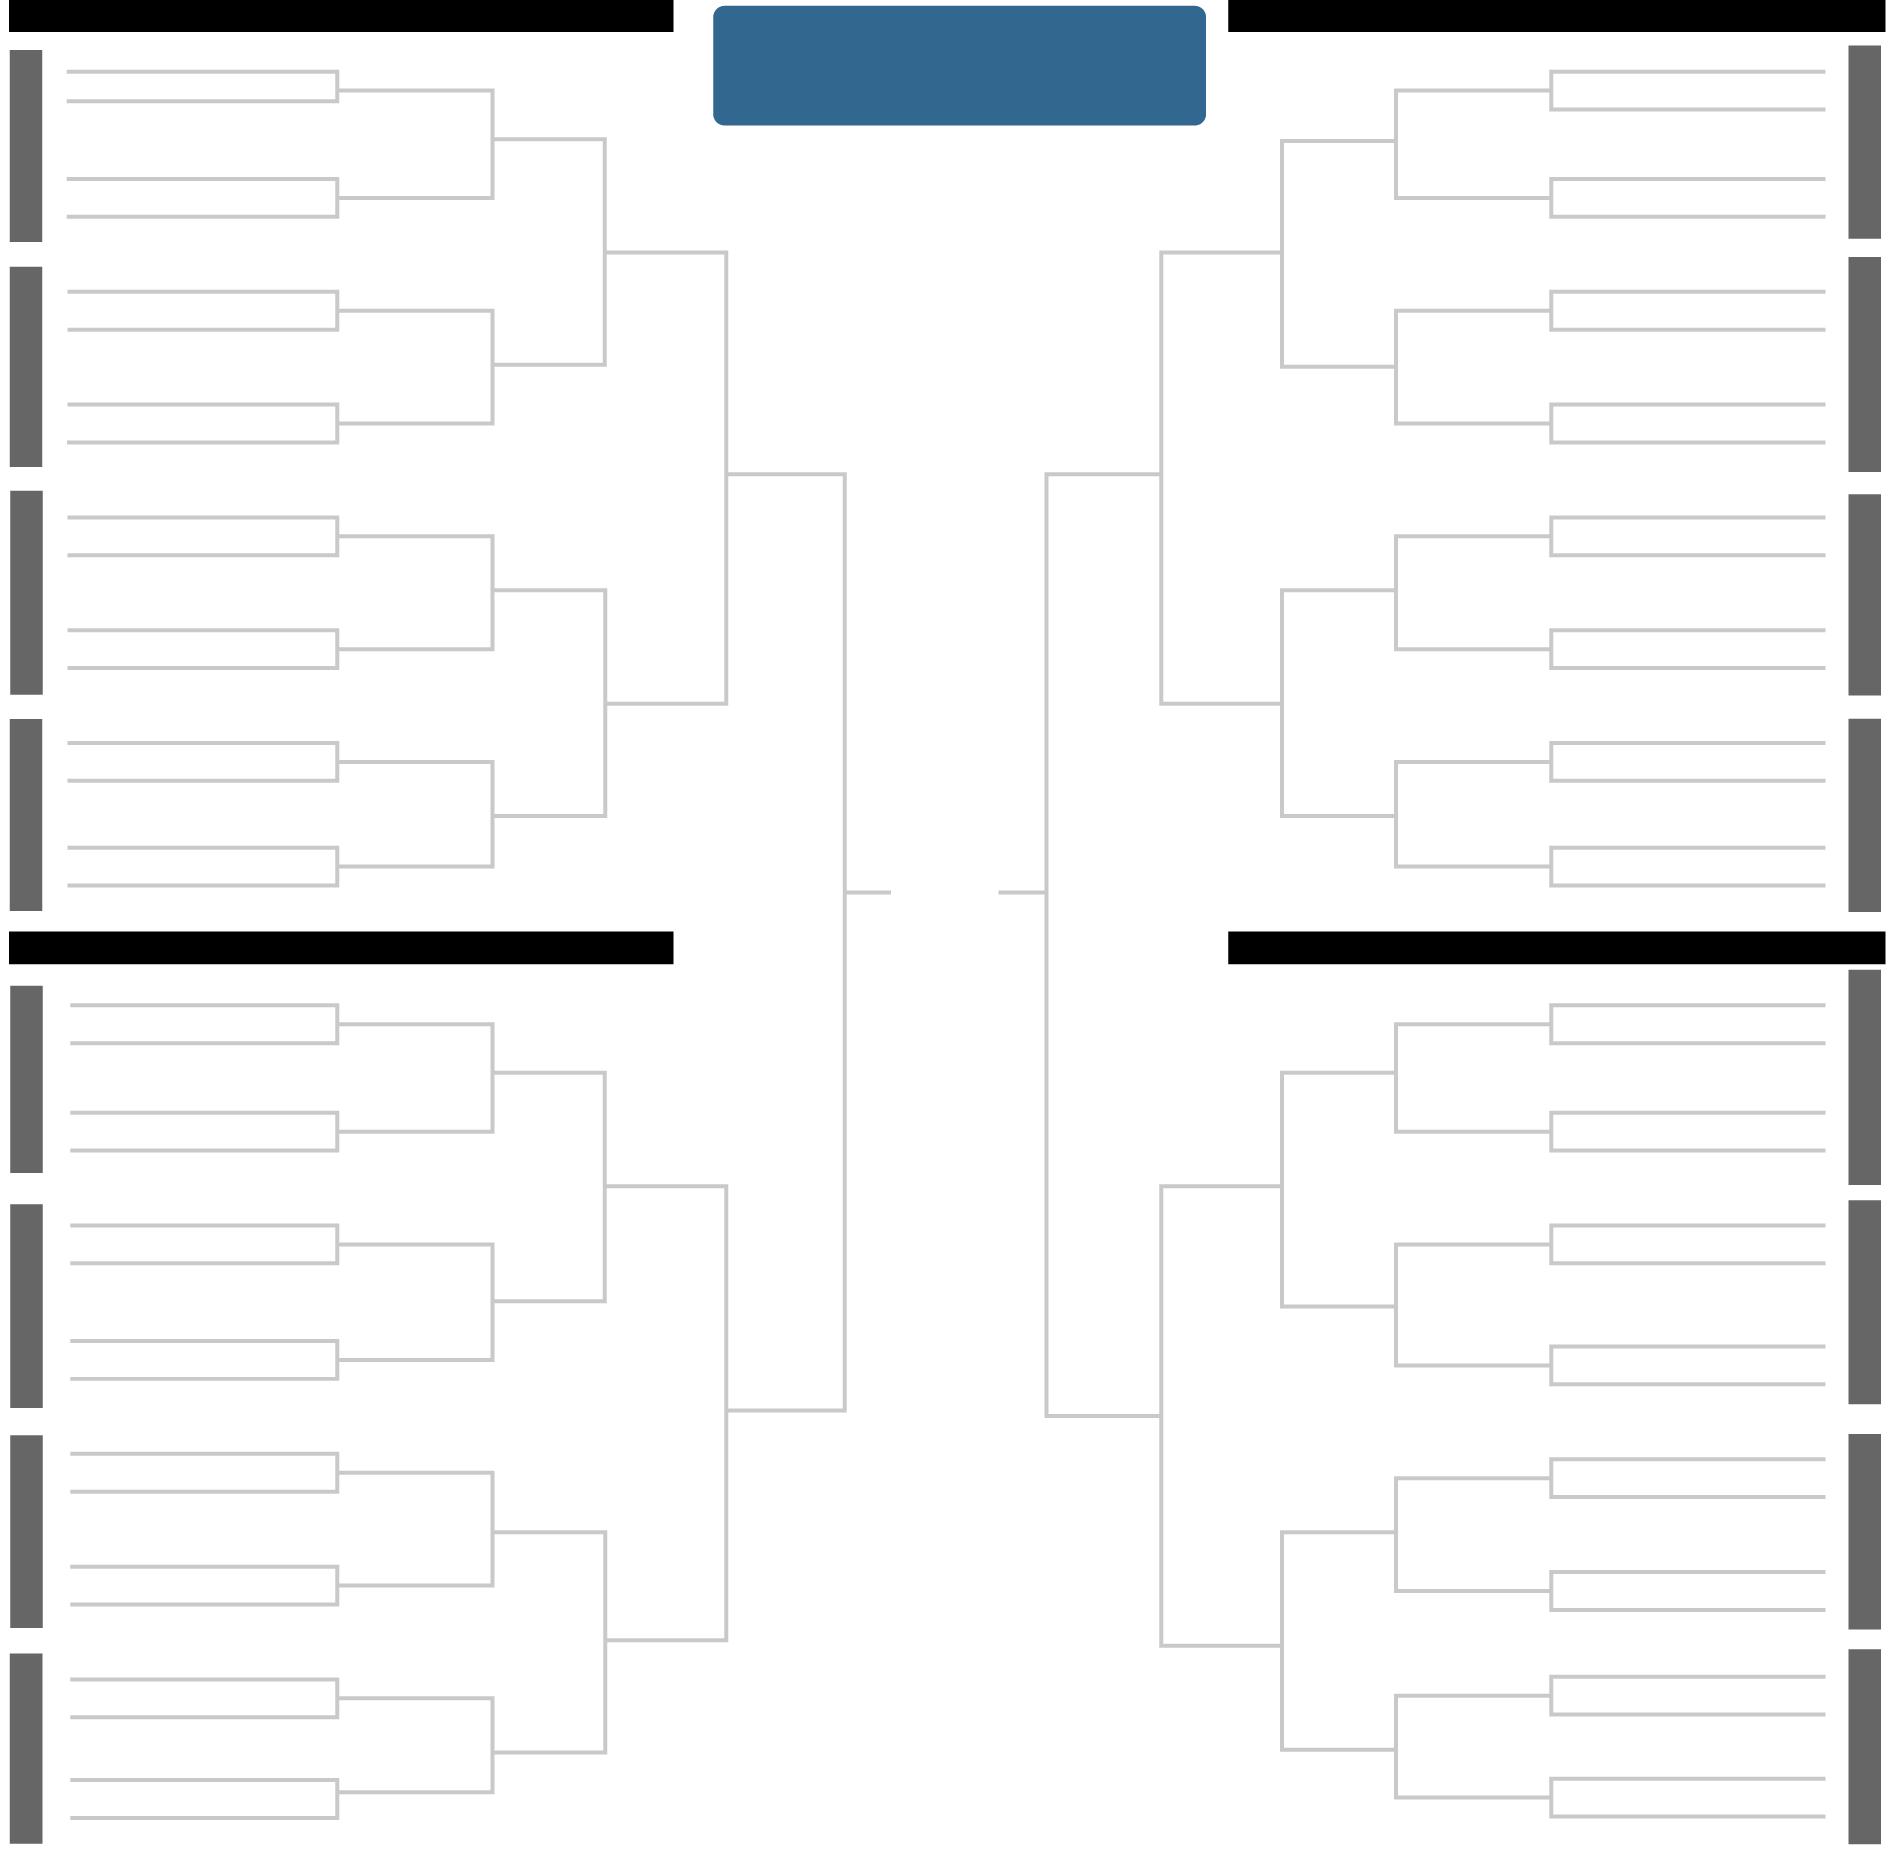 Printable 2018 N C A A Men S Tournament Bracket Ncaa Tournament Bracket Ncaa Ncaa Basketball Tournament